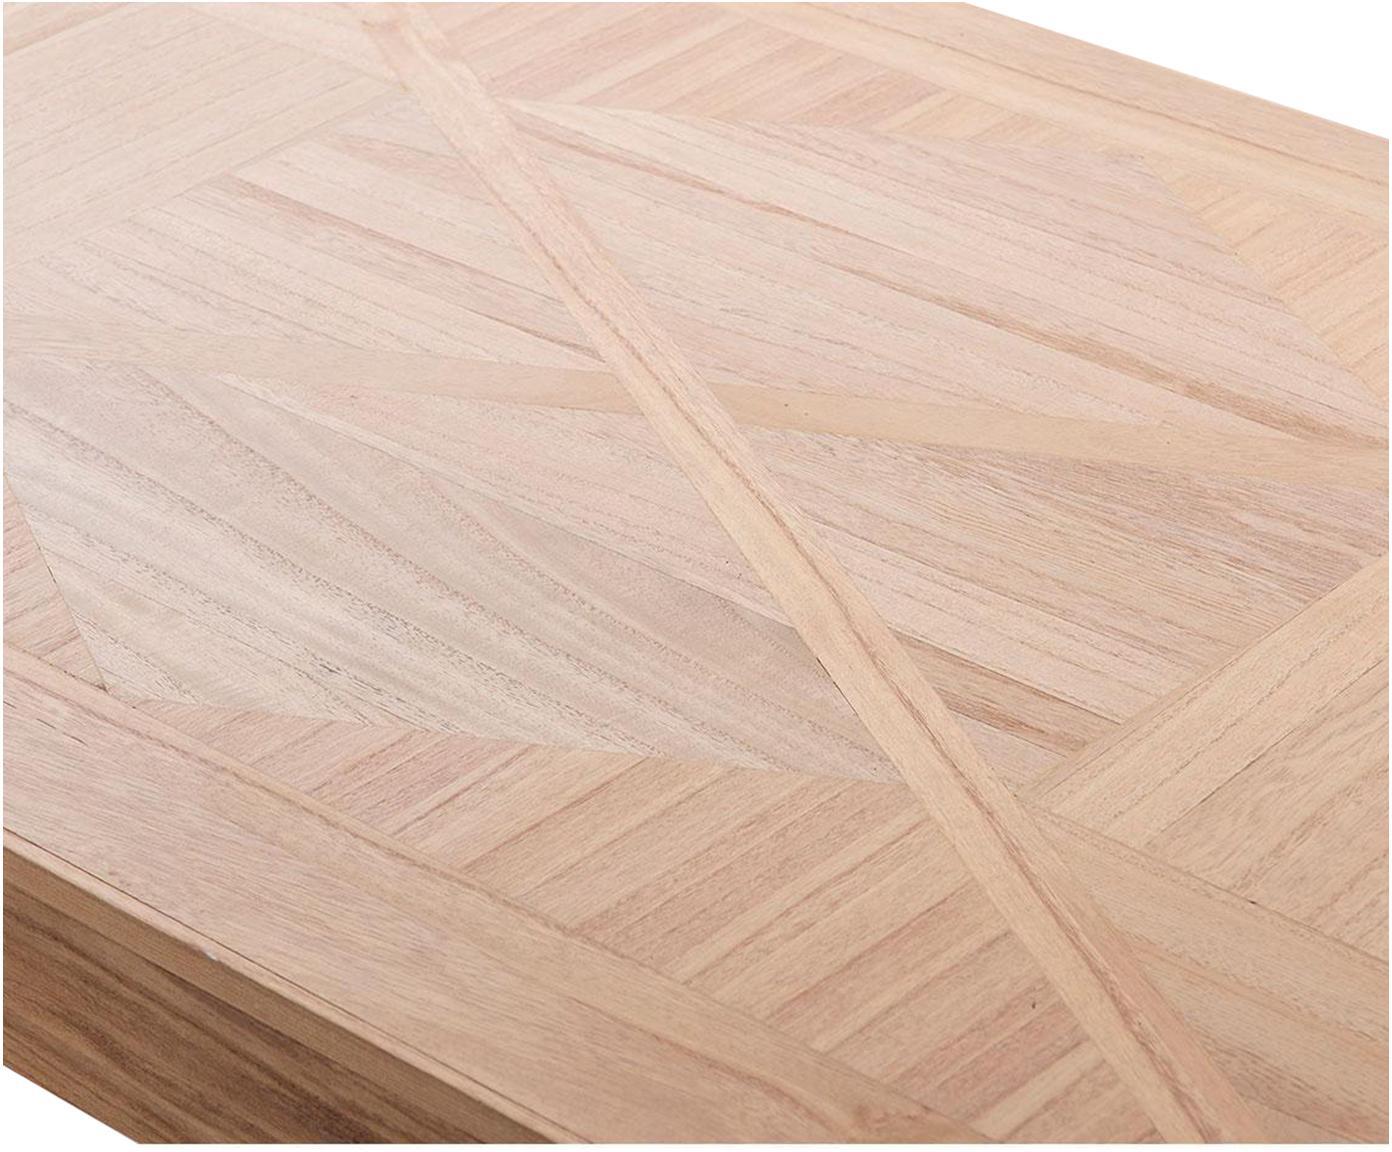 Mesa de centro Nick, Tablero: fibras de densidad media , Beige, An 120 x F 75 cm